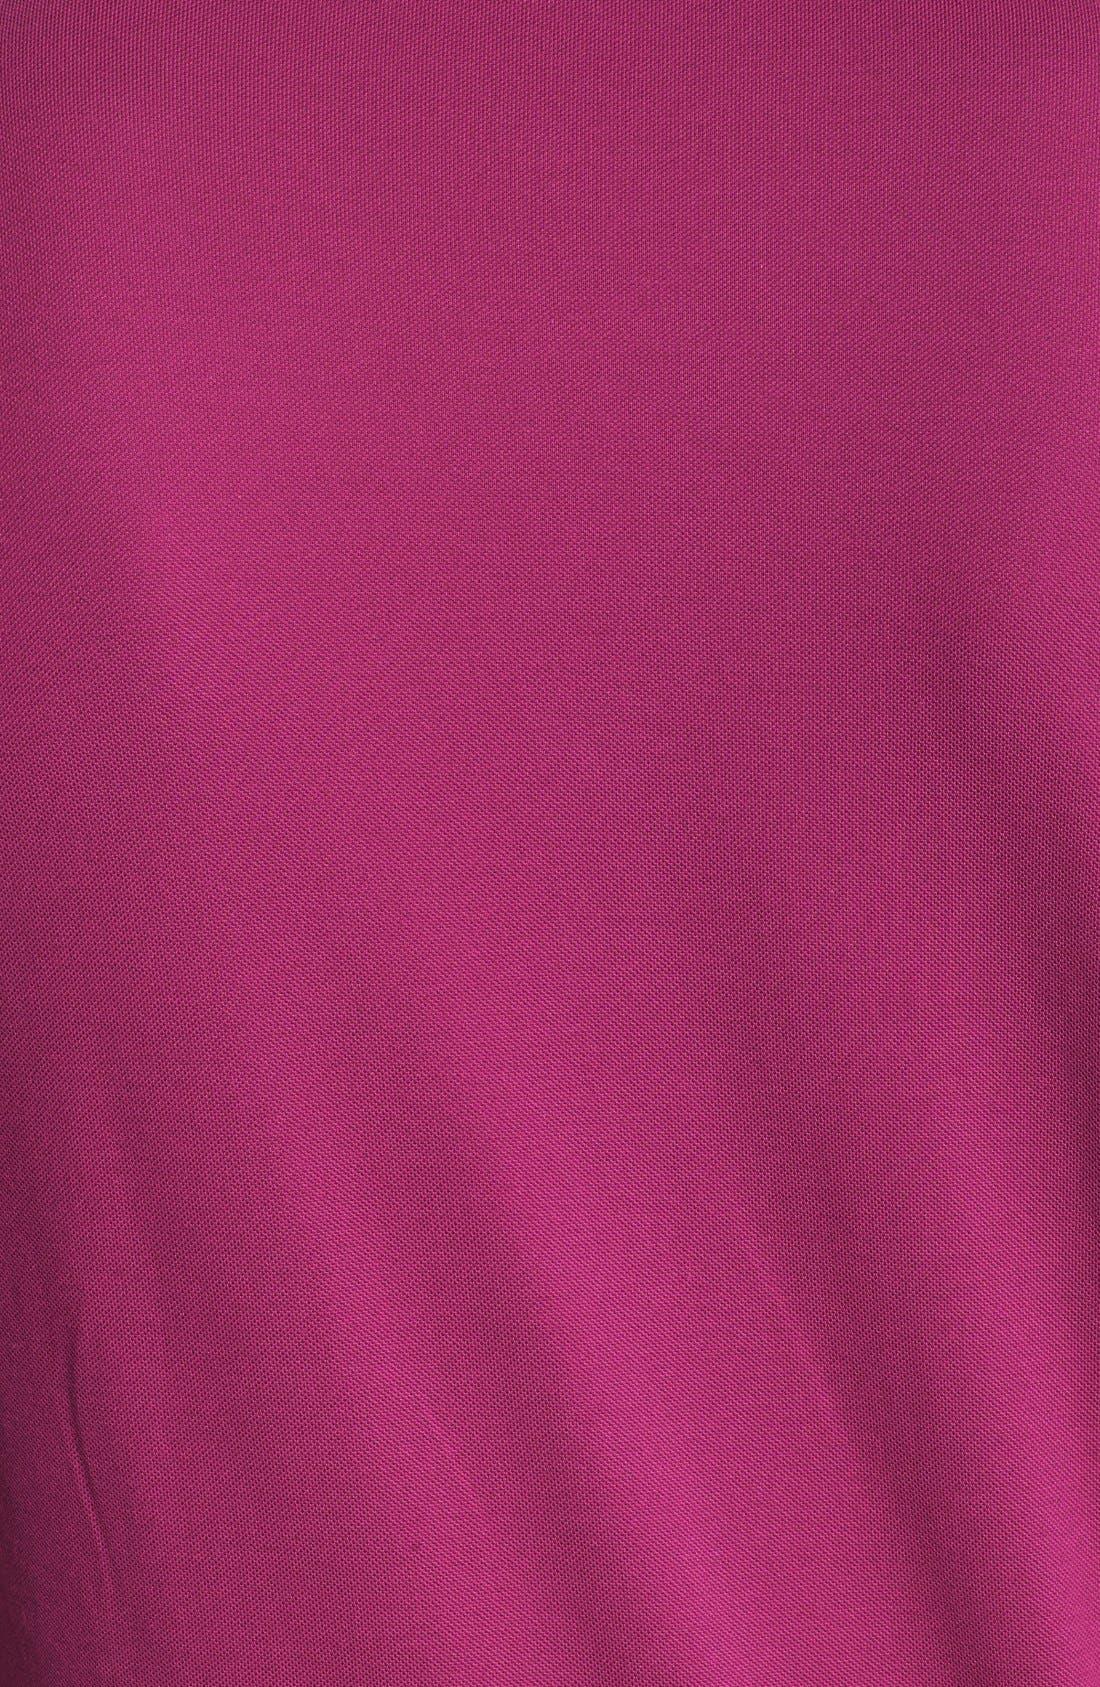 HUGO BOSS 'Firenze 43' Regular Fit Jersey Polo,                             Alternate thumbnail 3, color,                             Berry